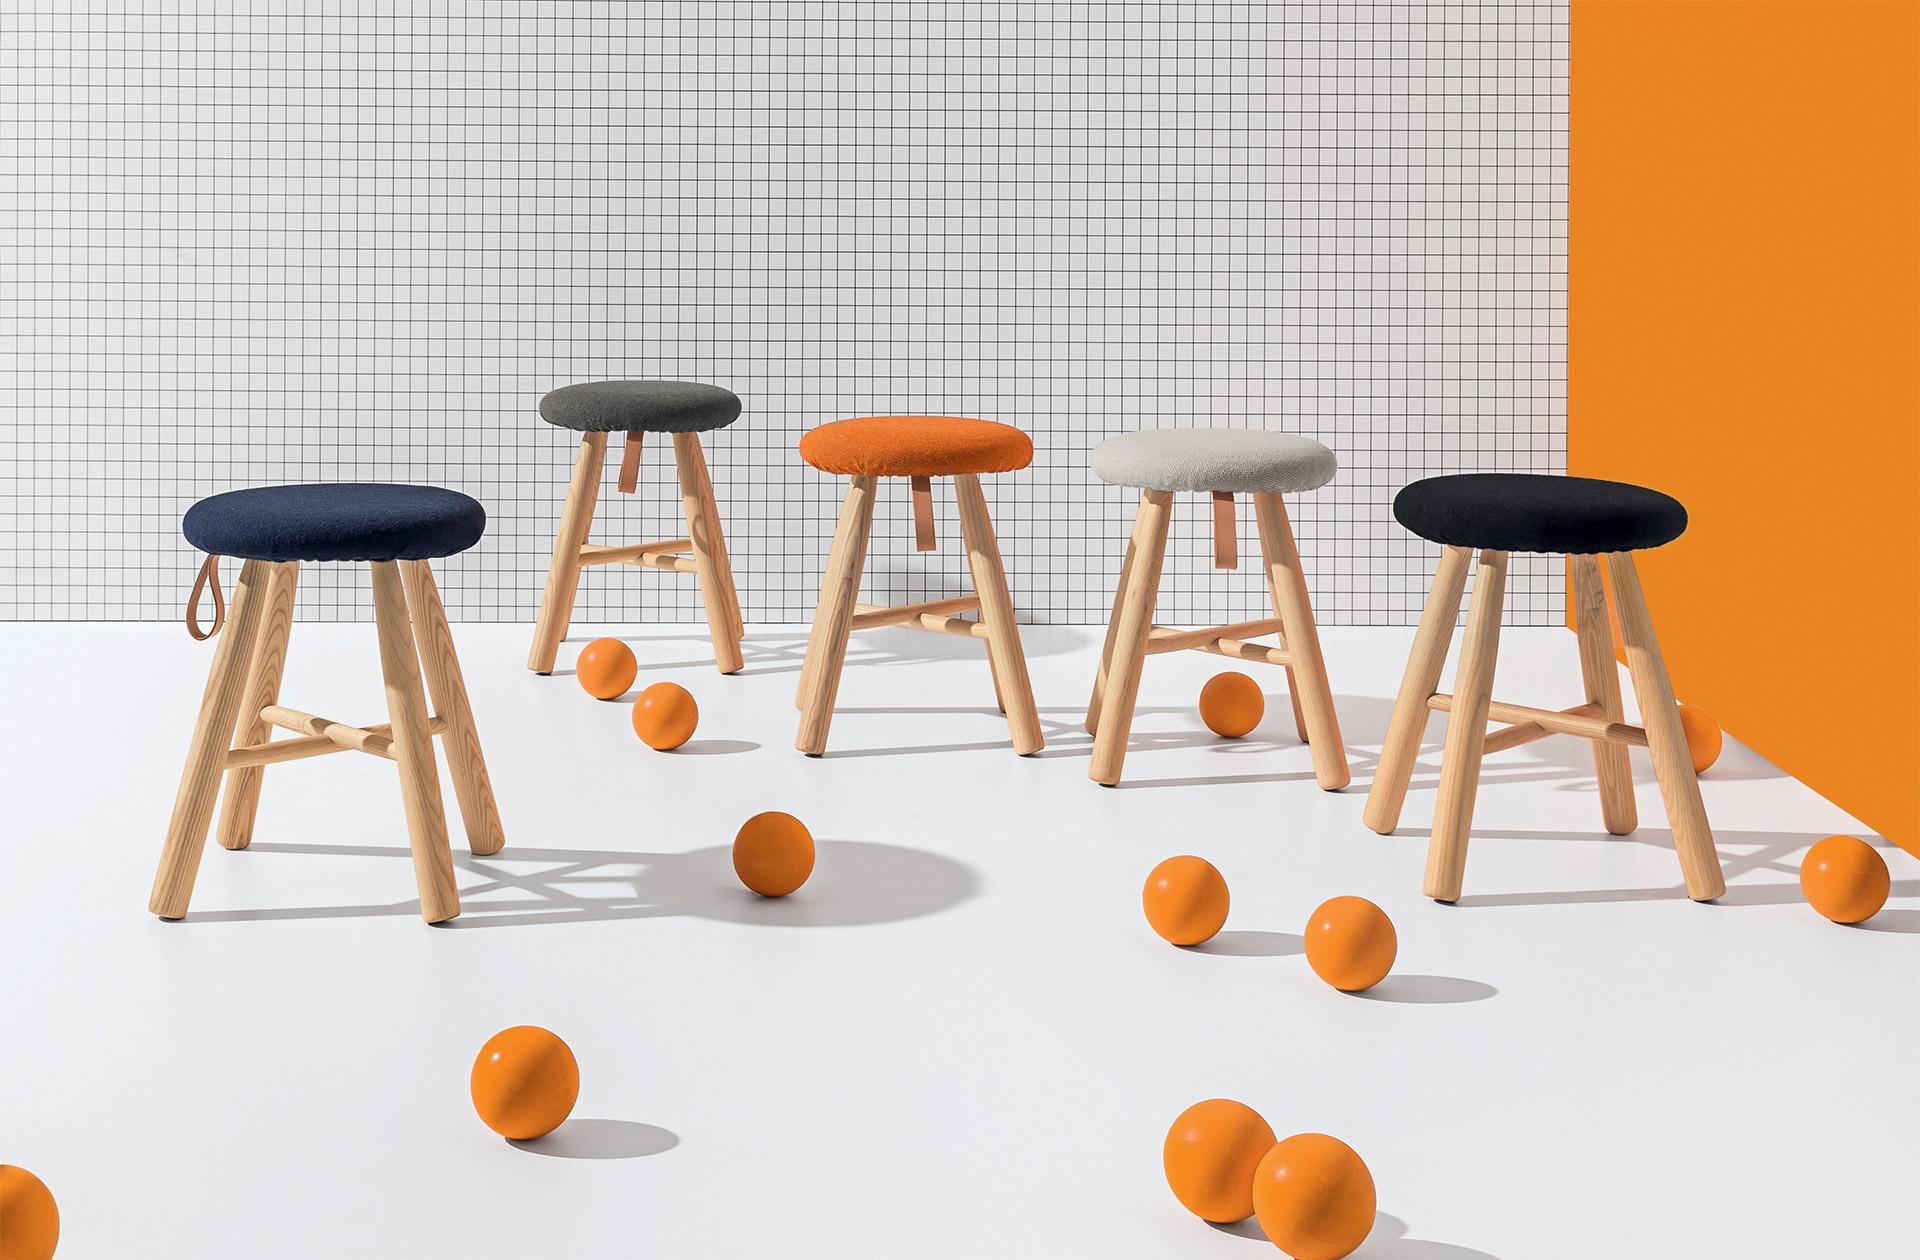 Tag stool sgabelli sgabelli in legno sgabelli cucina